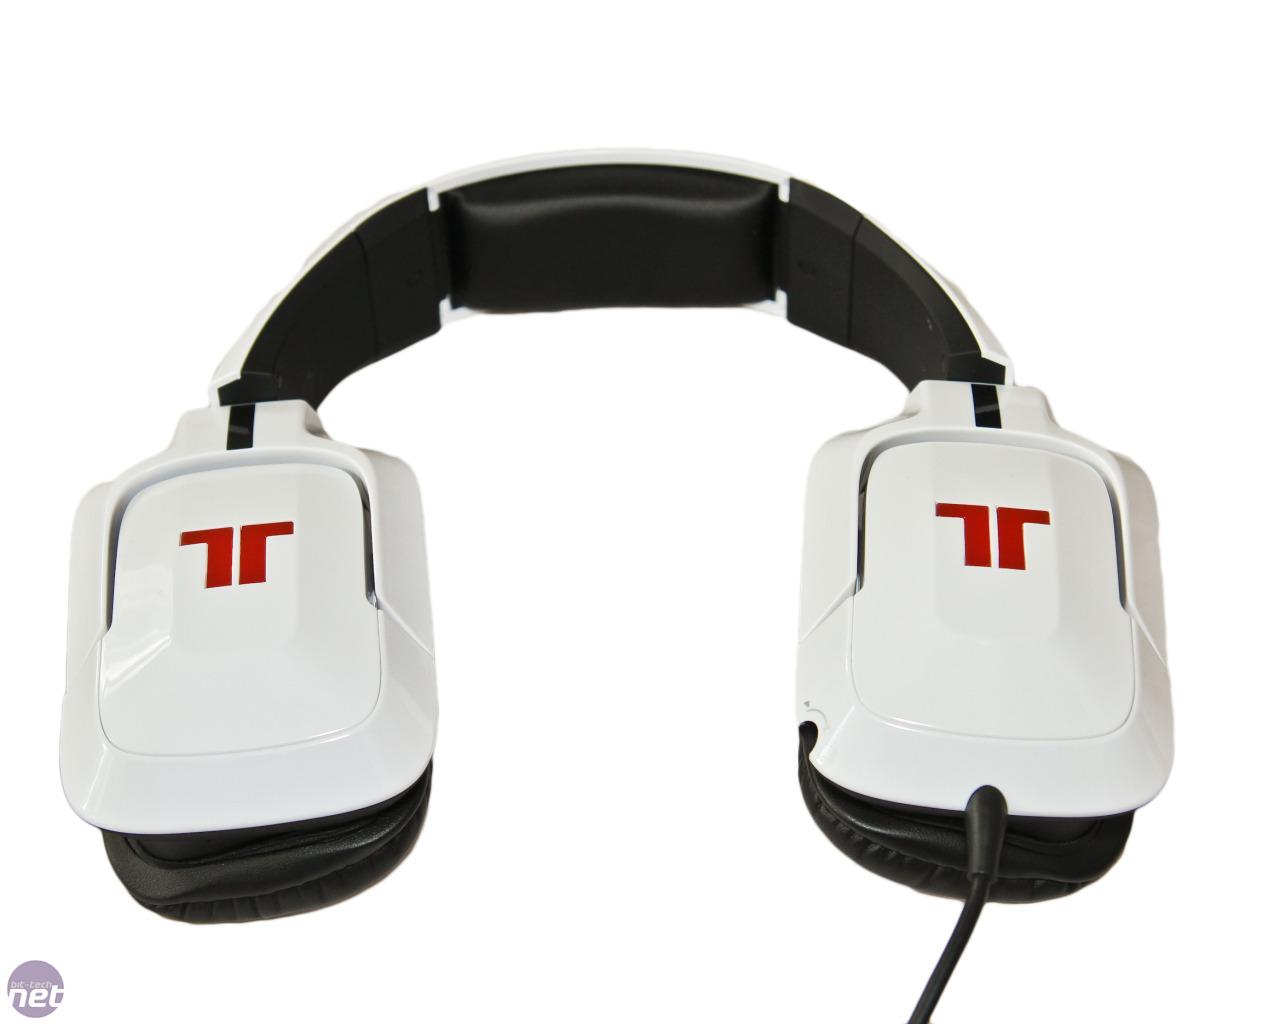 d71dd51d2ed Mad Catz Tritton Pro+ 5.1 Headset review | bit-tech.net